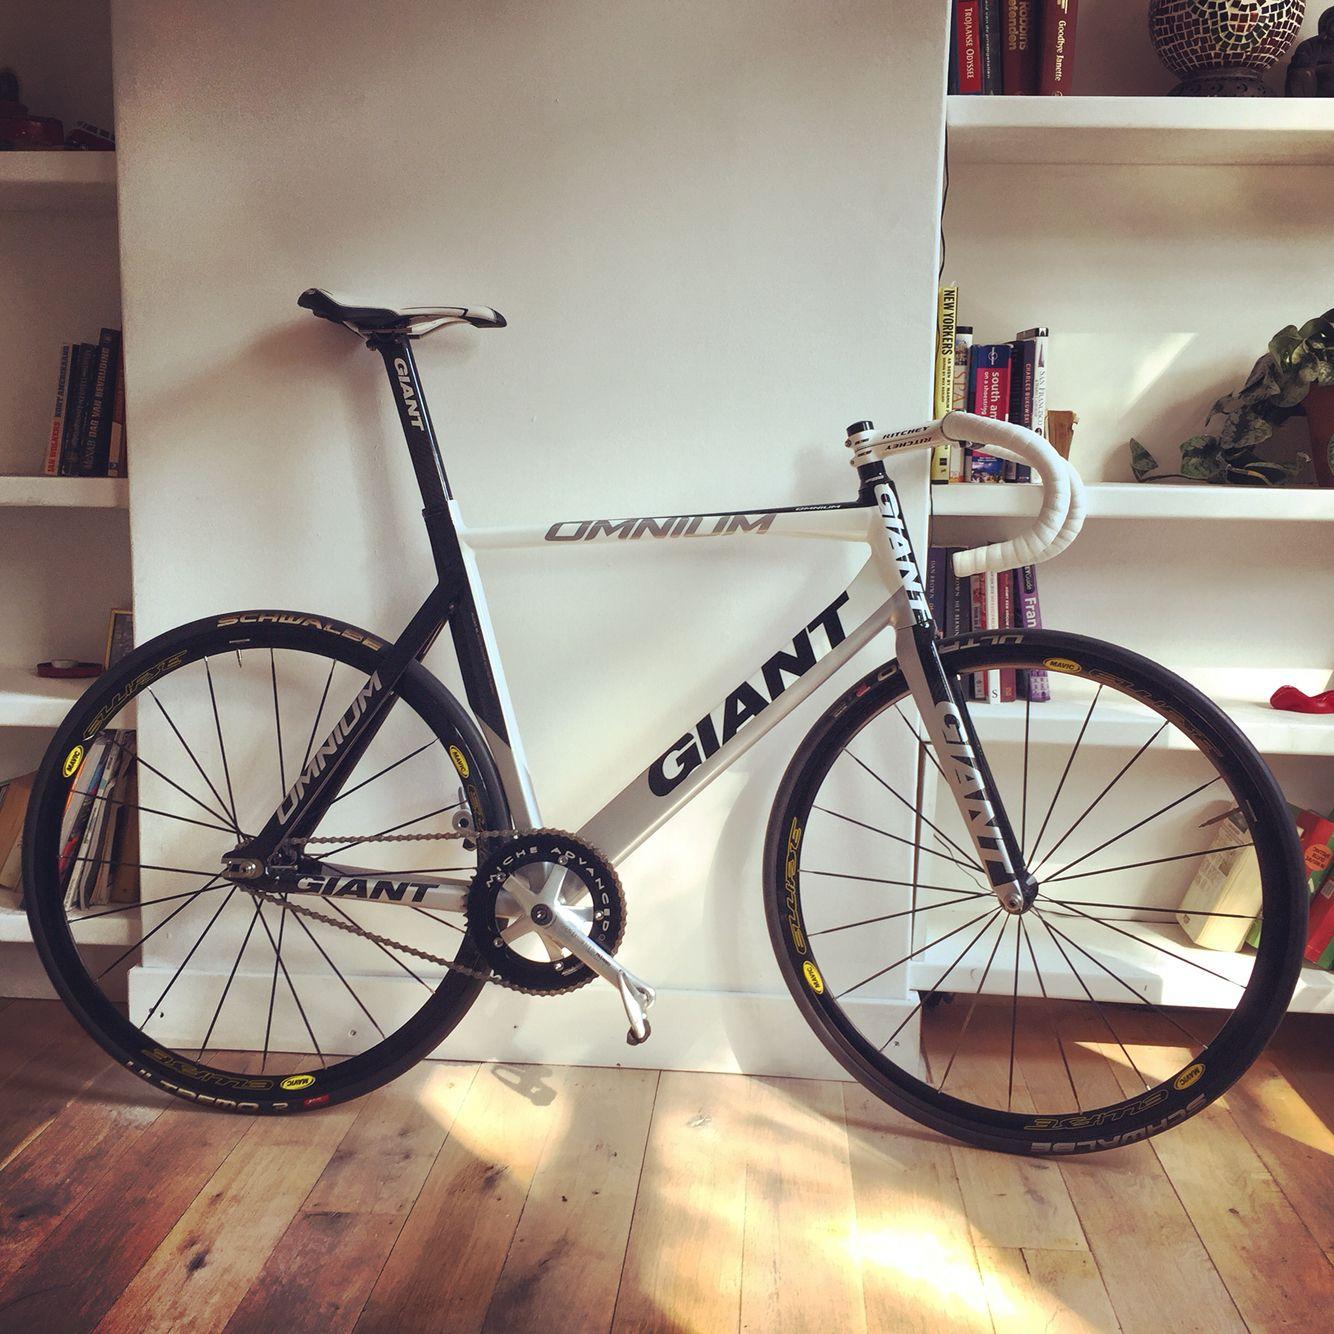 My new ride! #giant #fixedgear #fixie